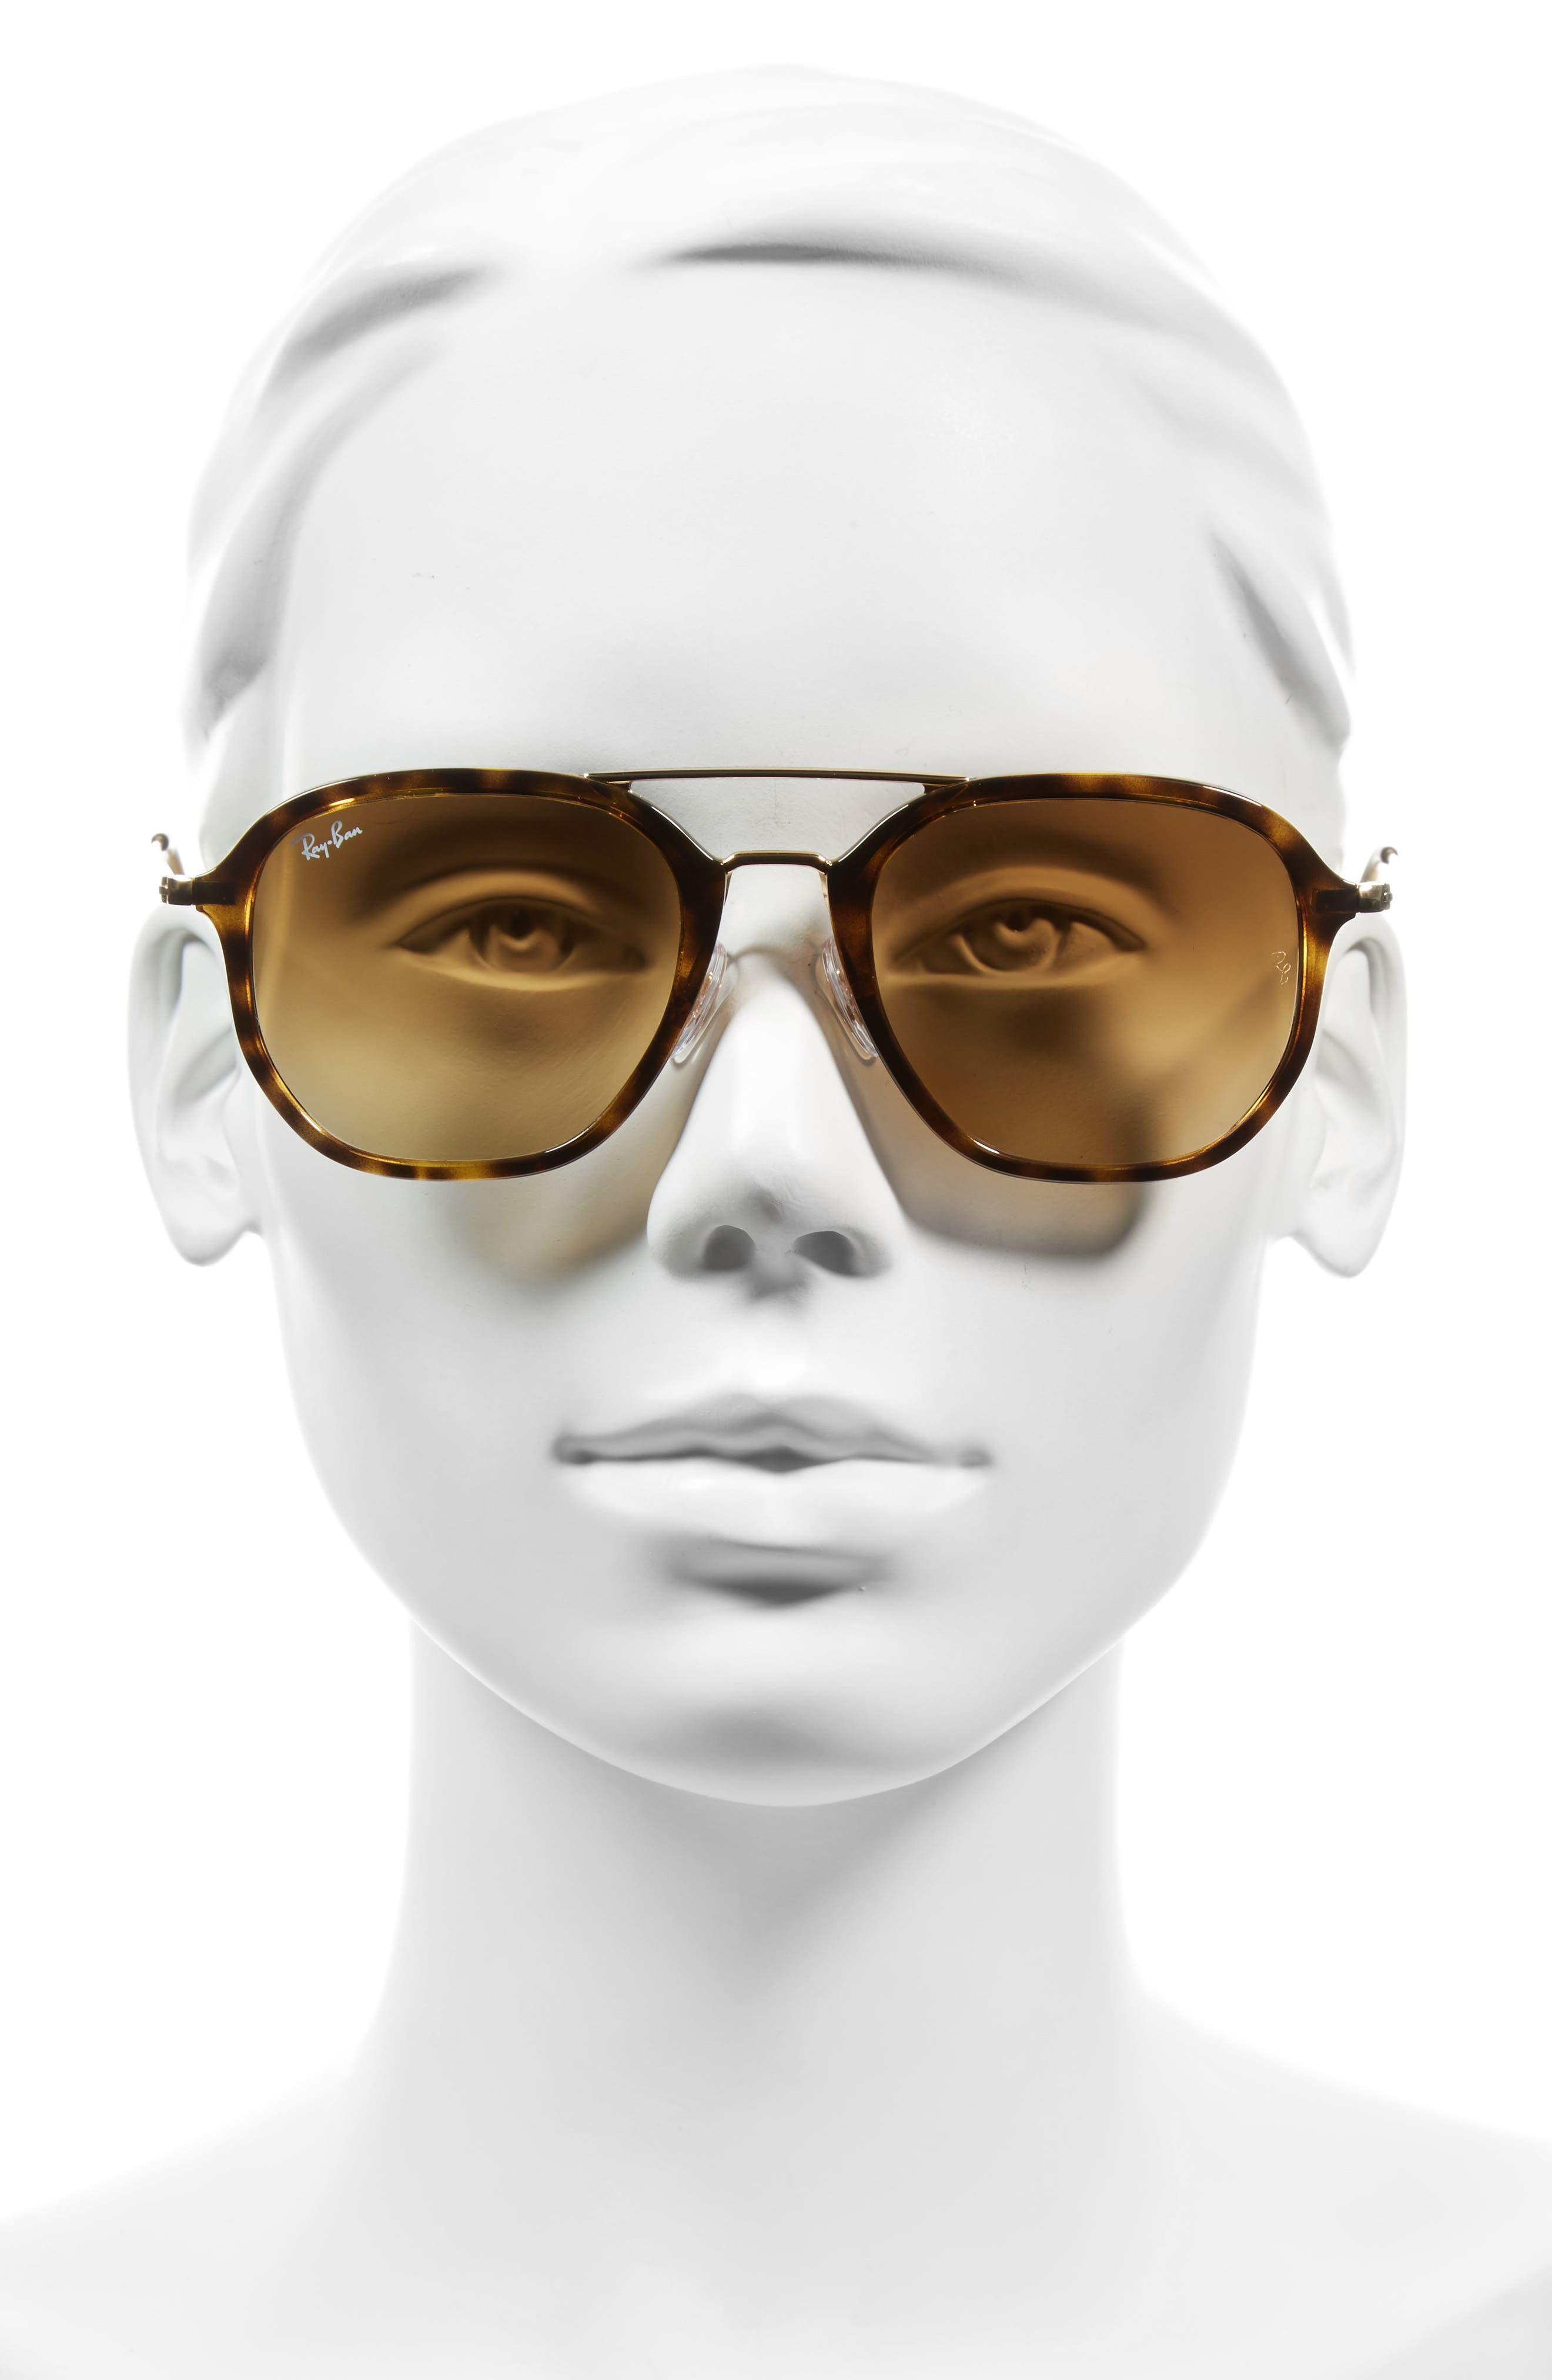 52mm Square Sunglasses,                             Alternate thumbnail 4, color,